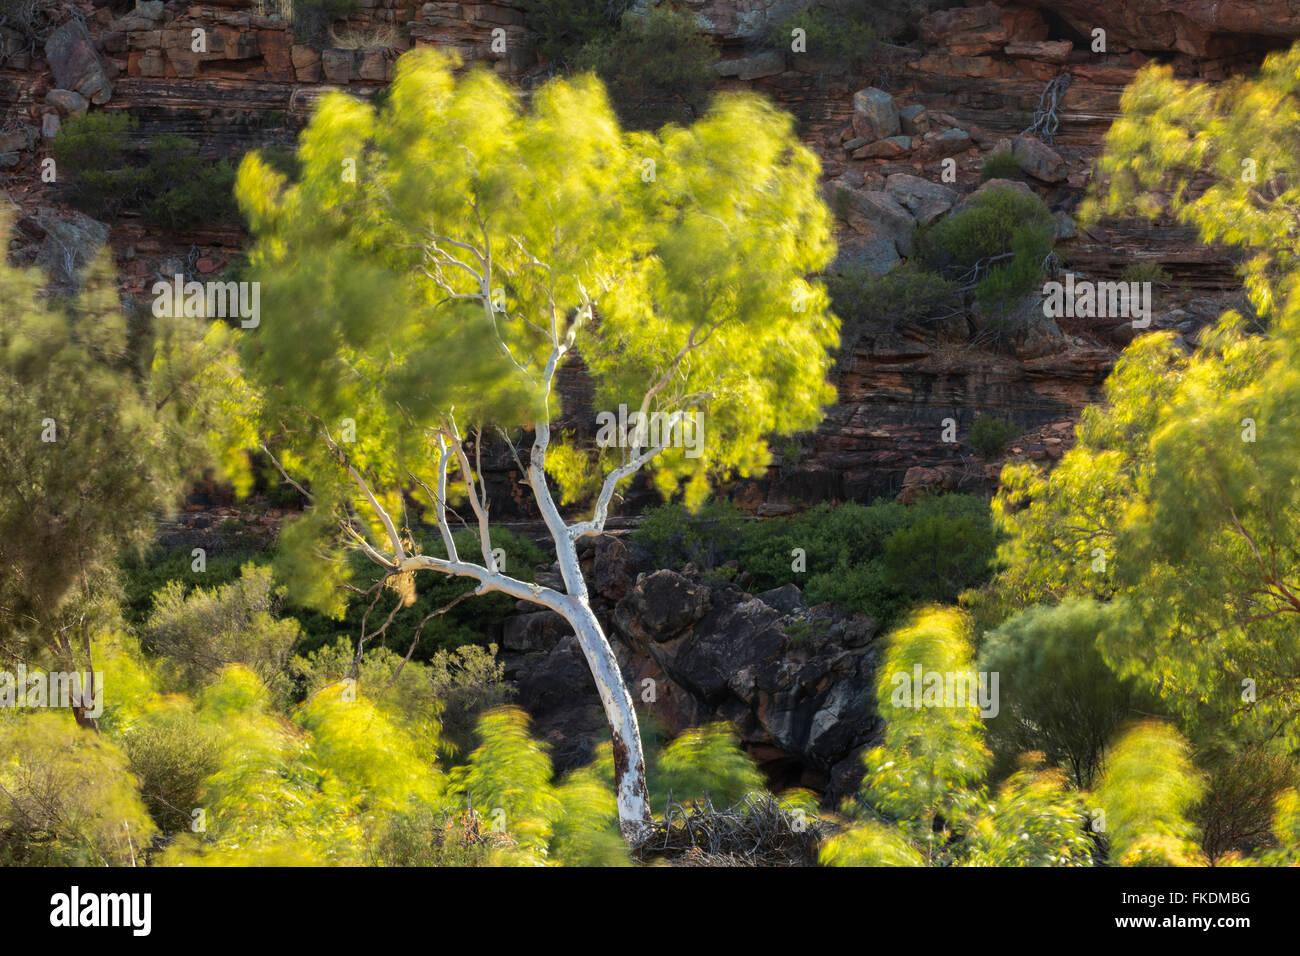 a eucalyptus tree in the Murchison River gorge at Ross Graham, Kalbarri National Park, Western Australia - Stock Image